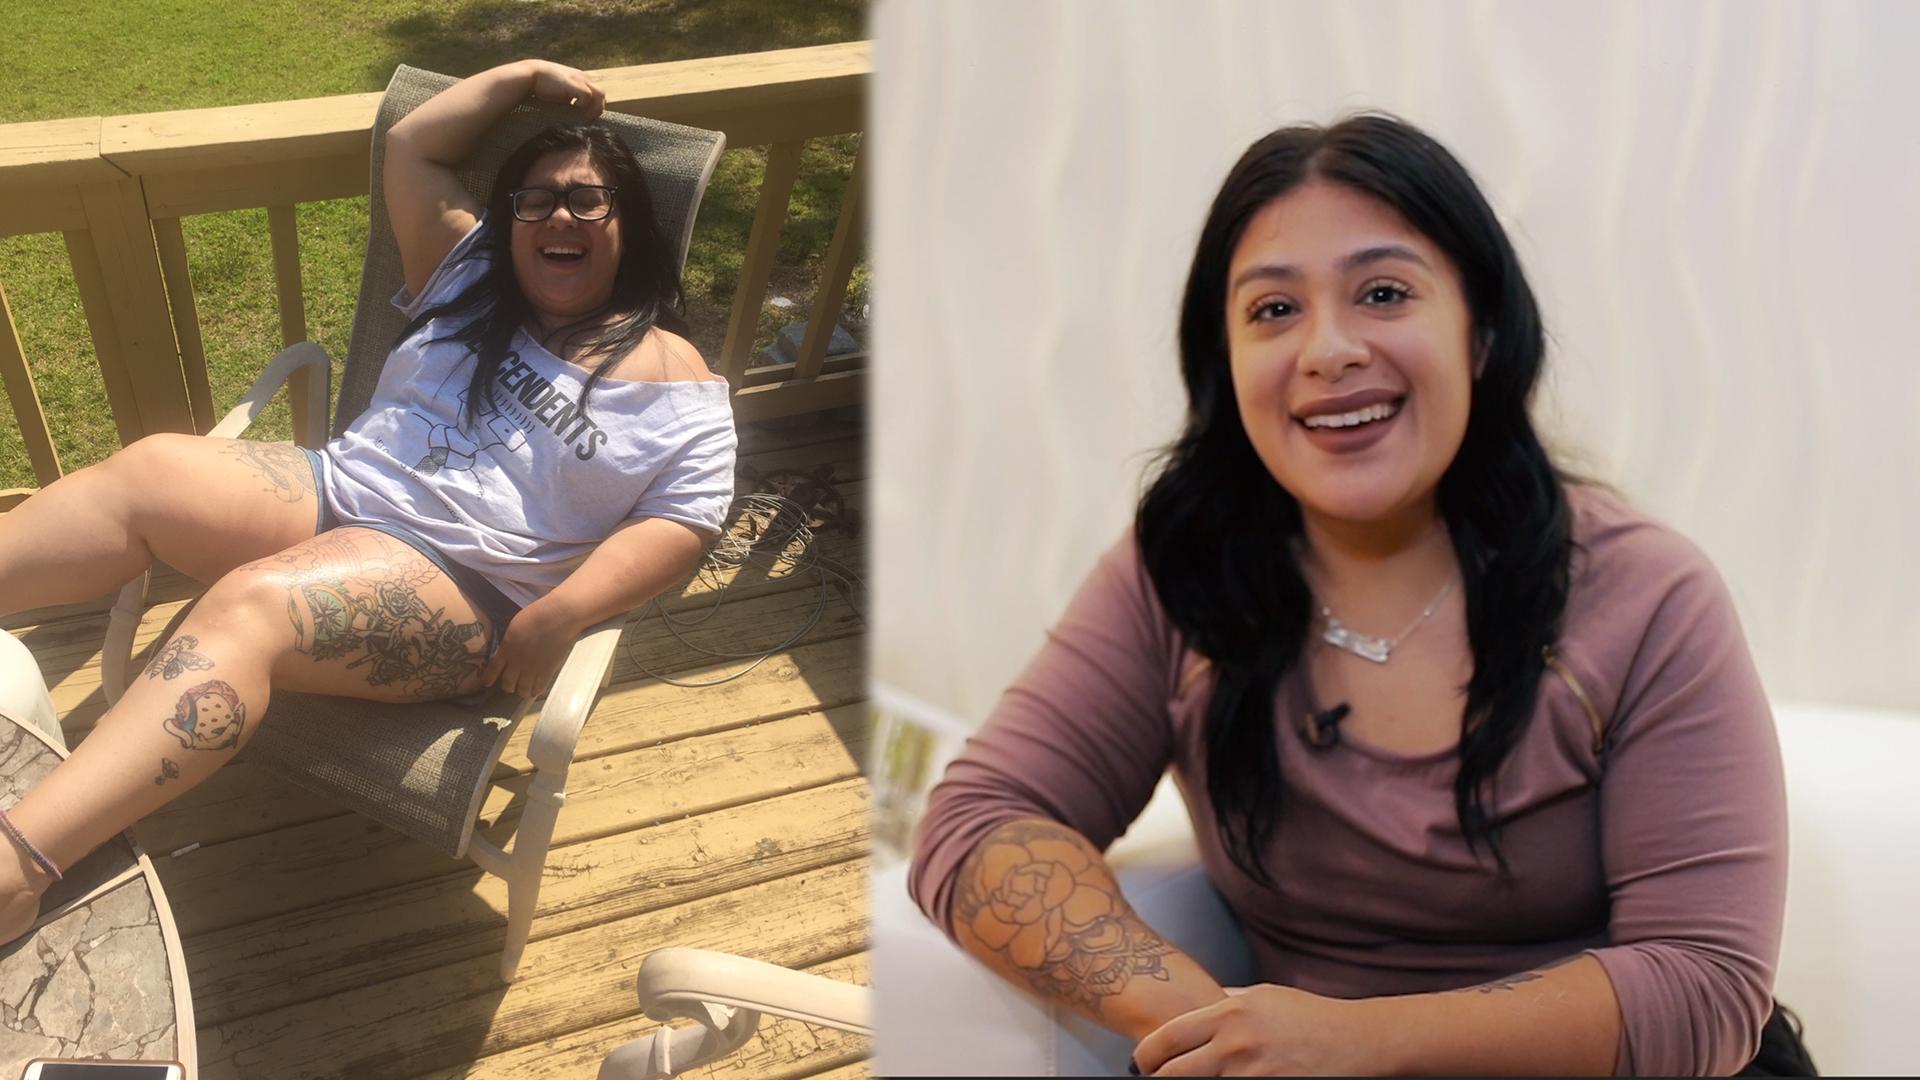 Amy Ulloa lost 85 pounds